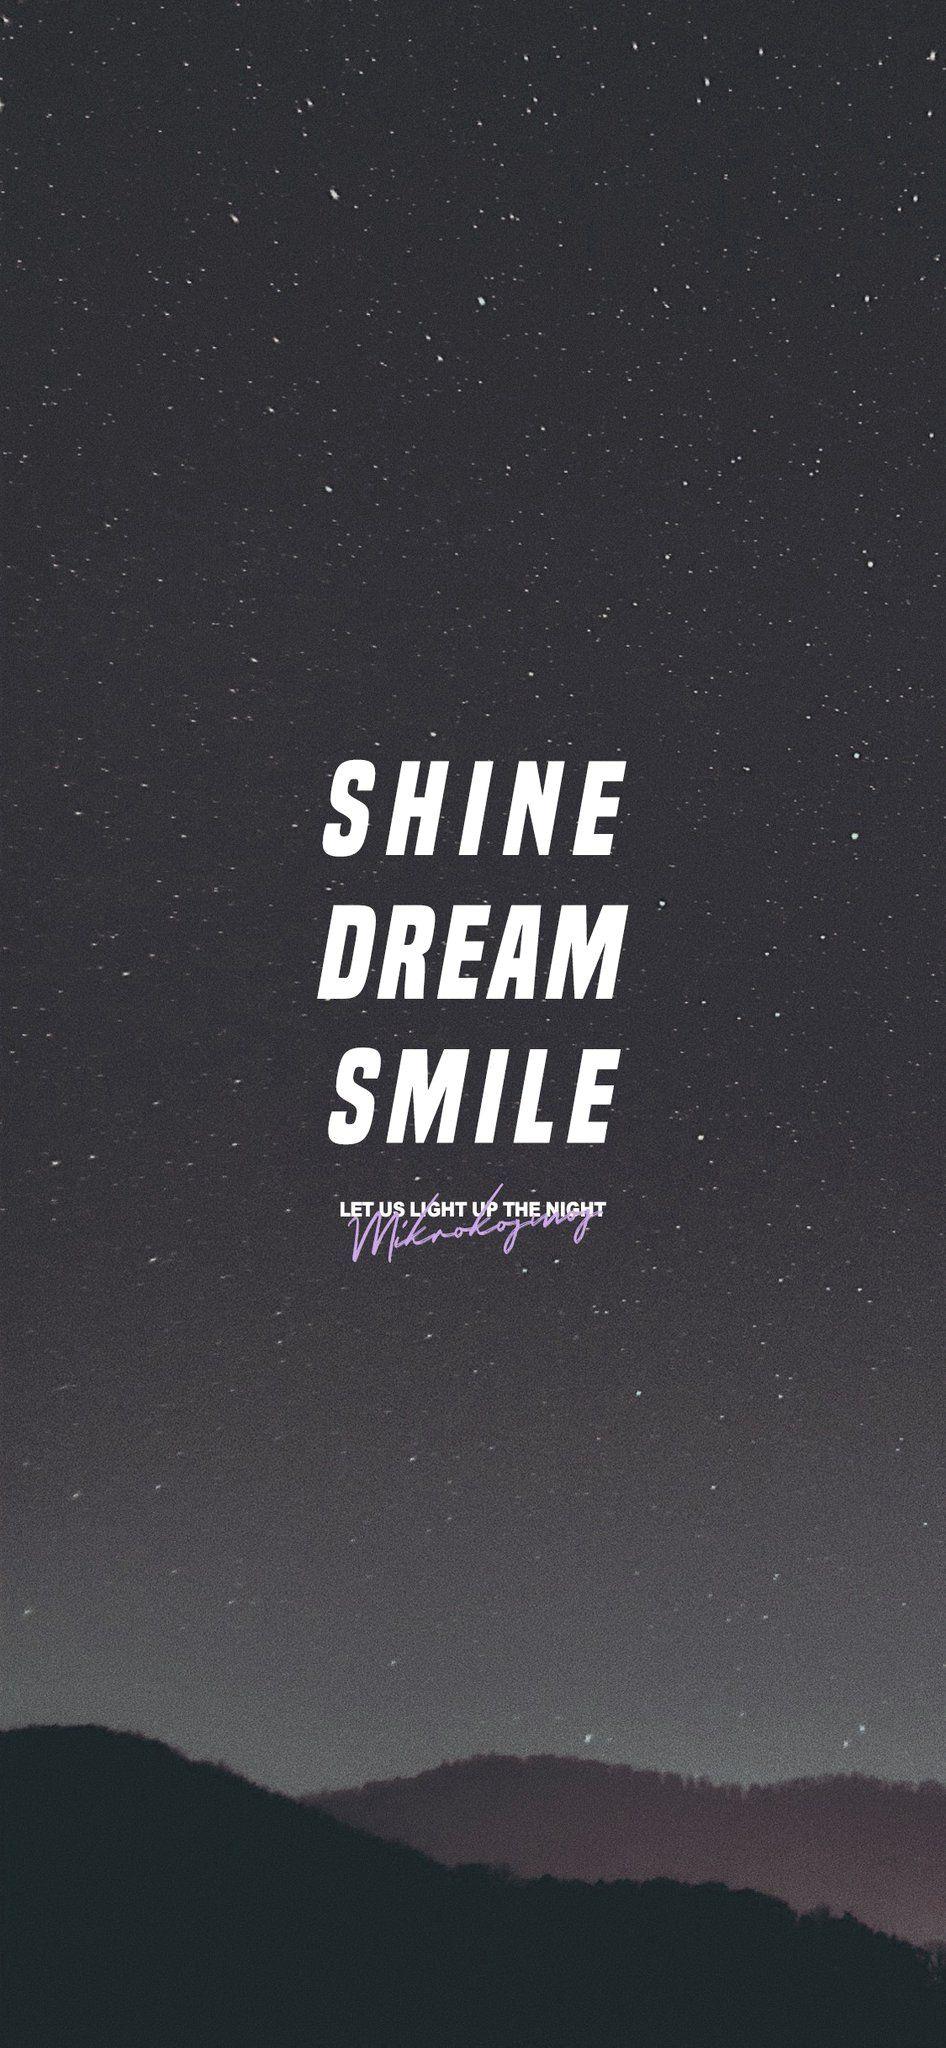 Unique Shine Dream Smile Bts Wallpaper In 2020 Bts Wallpaper Lyrics Bts Wallpaper Bts Lyrics Quotes